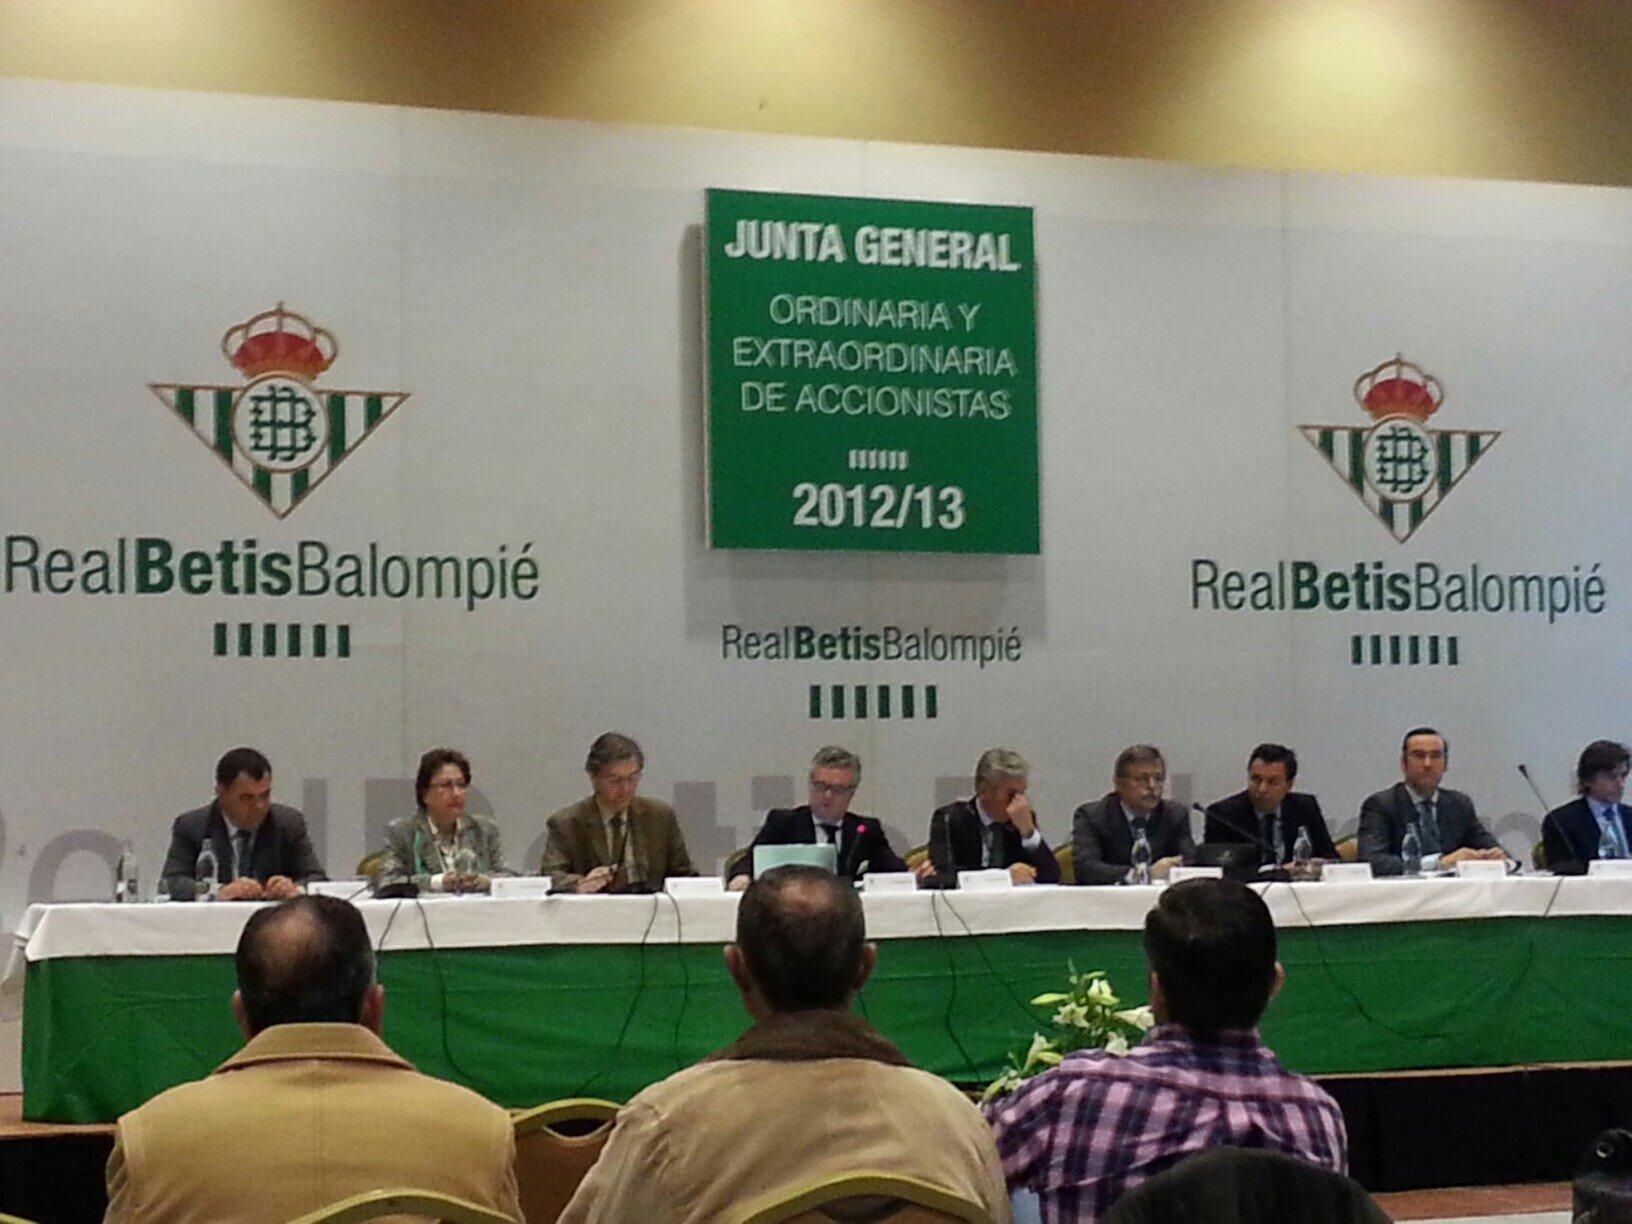 JuntaBetis